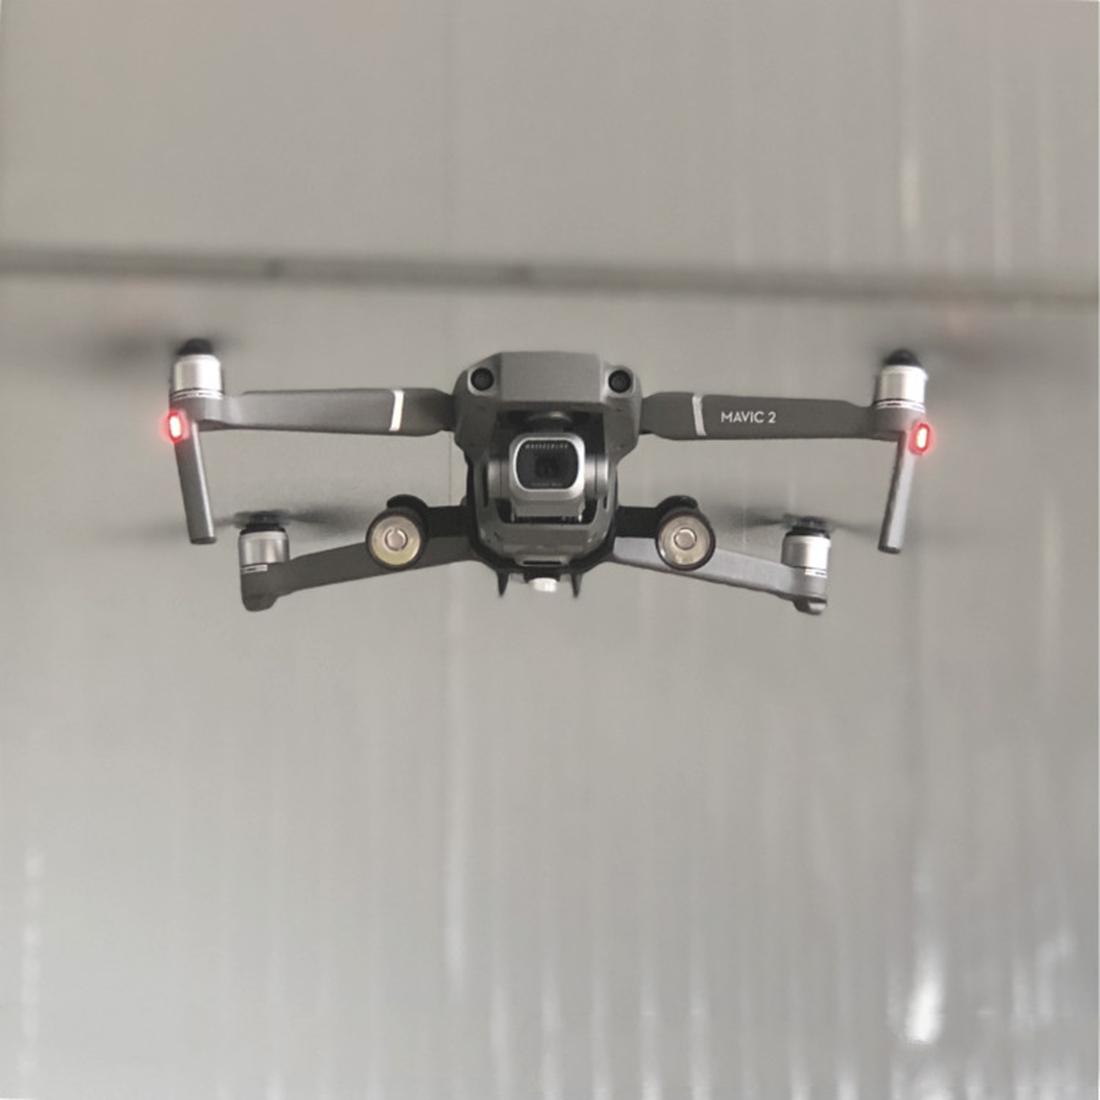 Flash LED Seach Light Night Flight Aerial Photo LED Light For DJI Mavic 2 Pro/Zoom RC Drone